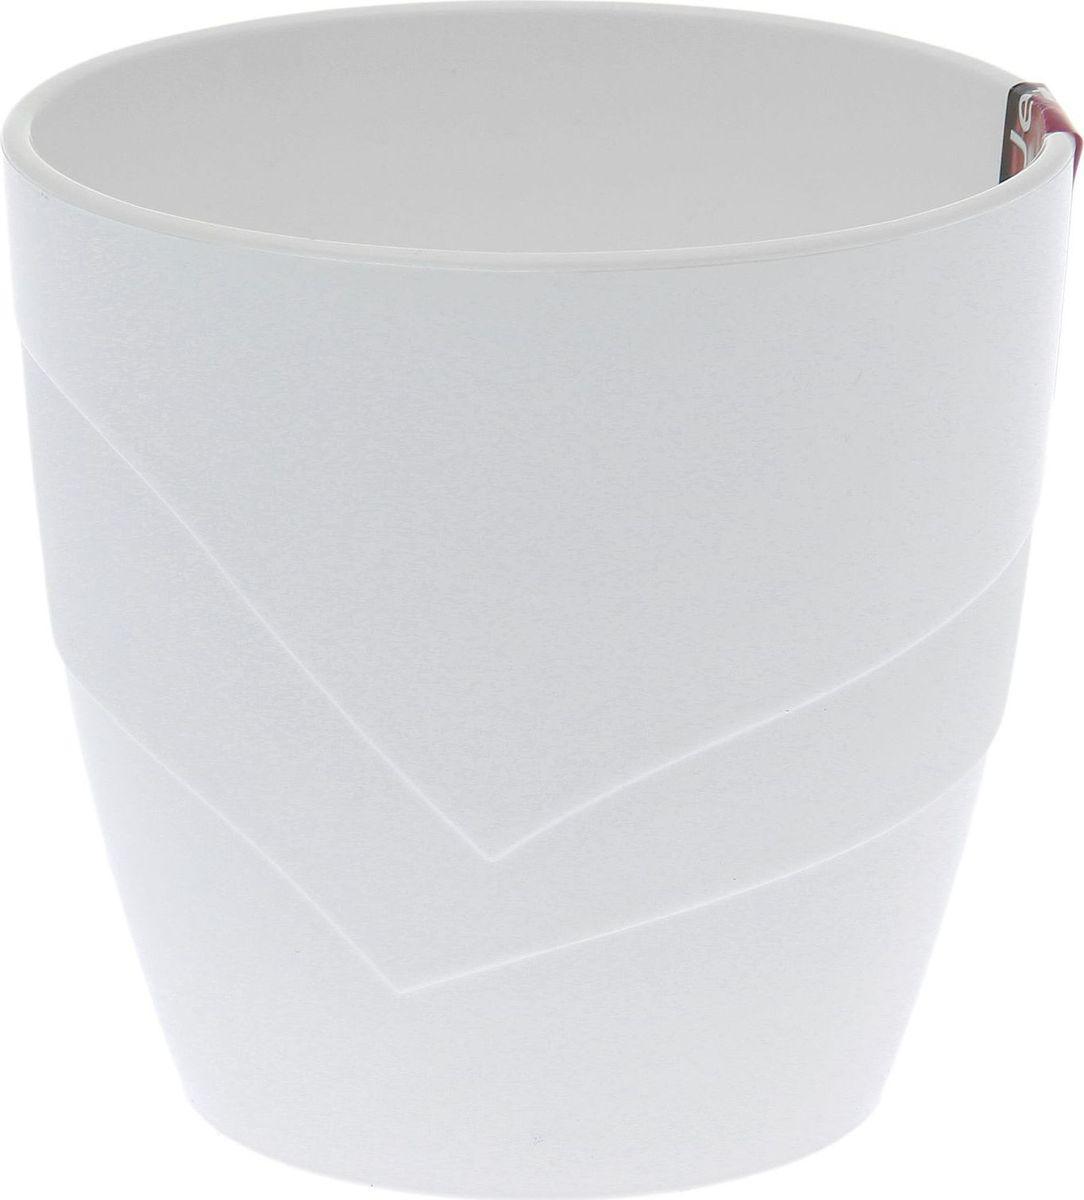 Кашпо JetPlast Грация, цвет: белый, 2 л1694309